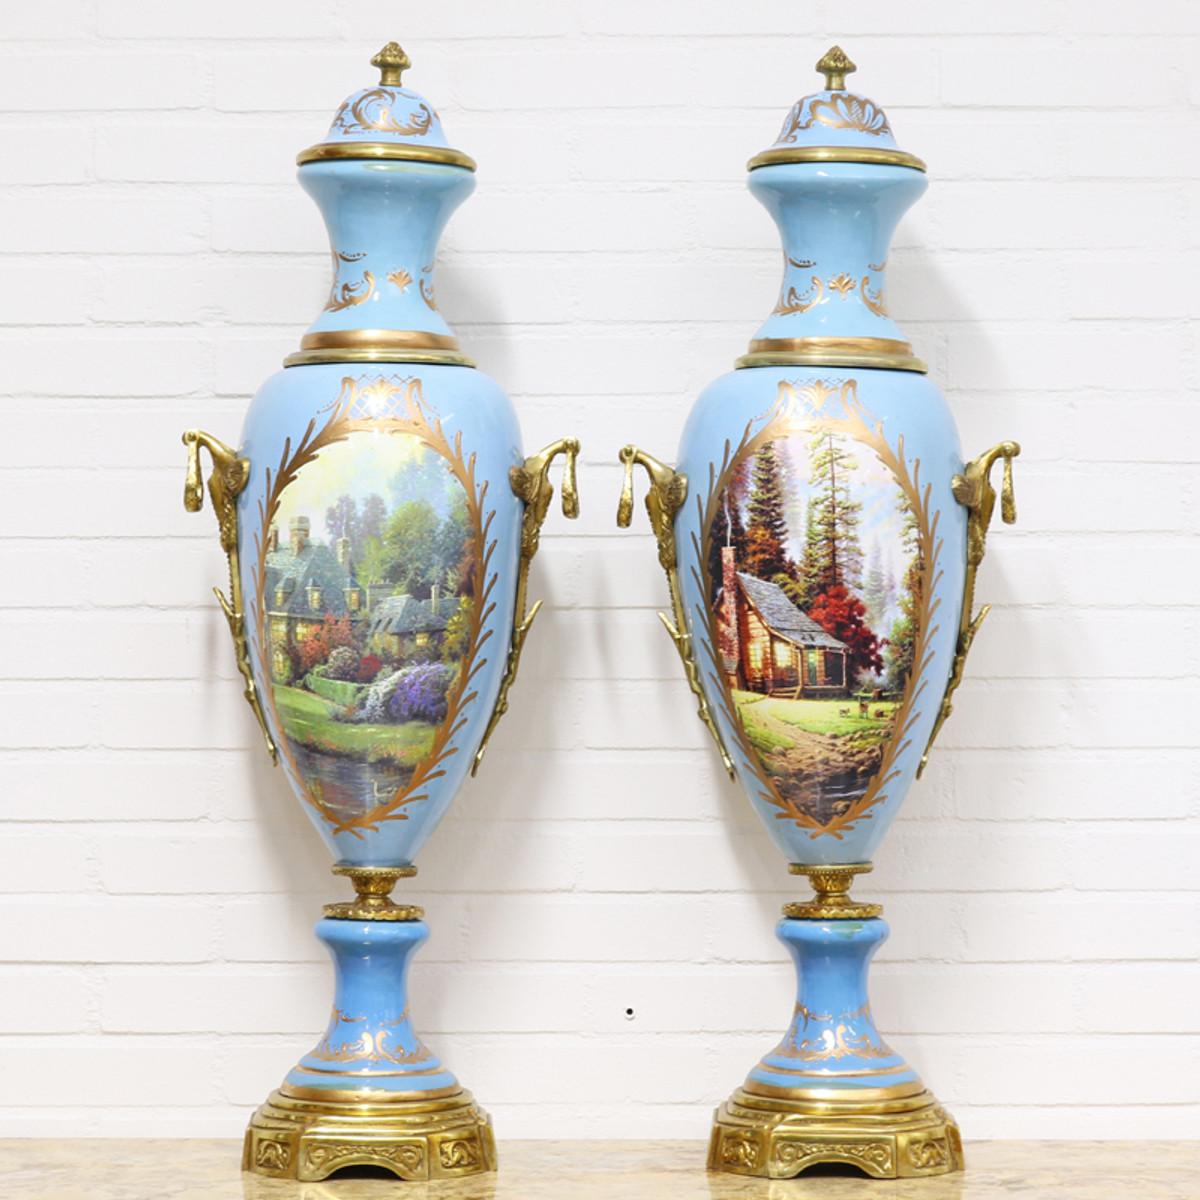 casa padrino deko vasen hellblau gold 30 x h 100 cm barockstil porzellan vasen set. Black Bedroom Furniture Sets. Home Design Ideas